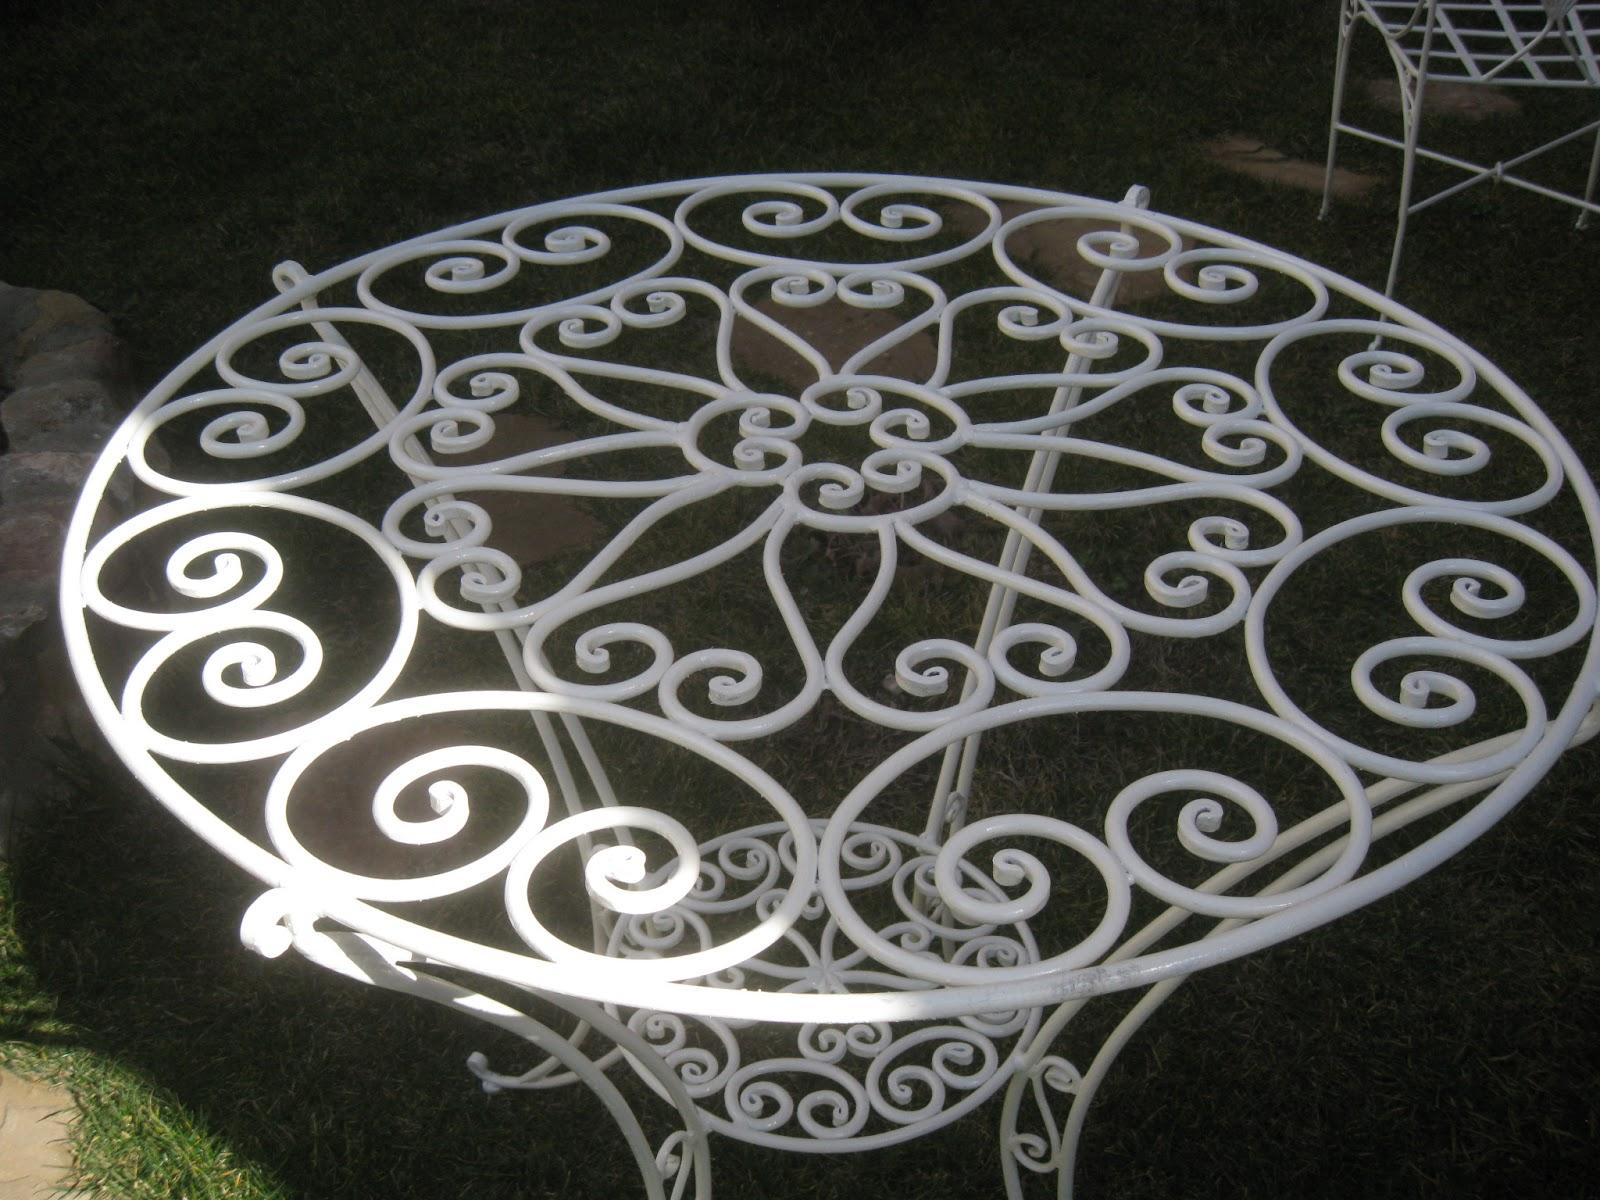 D co ikea juego jardin rouen 33 ikea lyon adresse ikea bureau micke ikea salle de bains - Balancin jardin ikea rouen ...